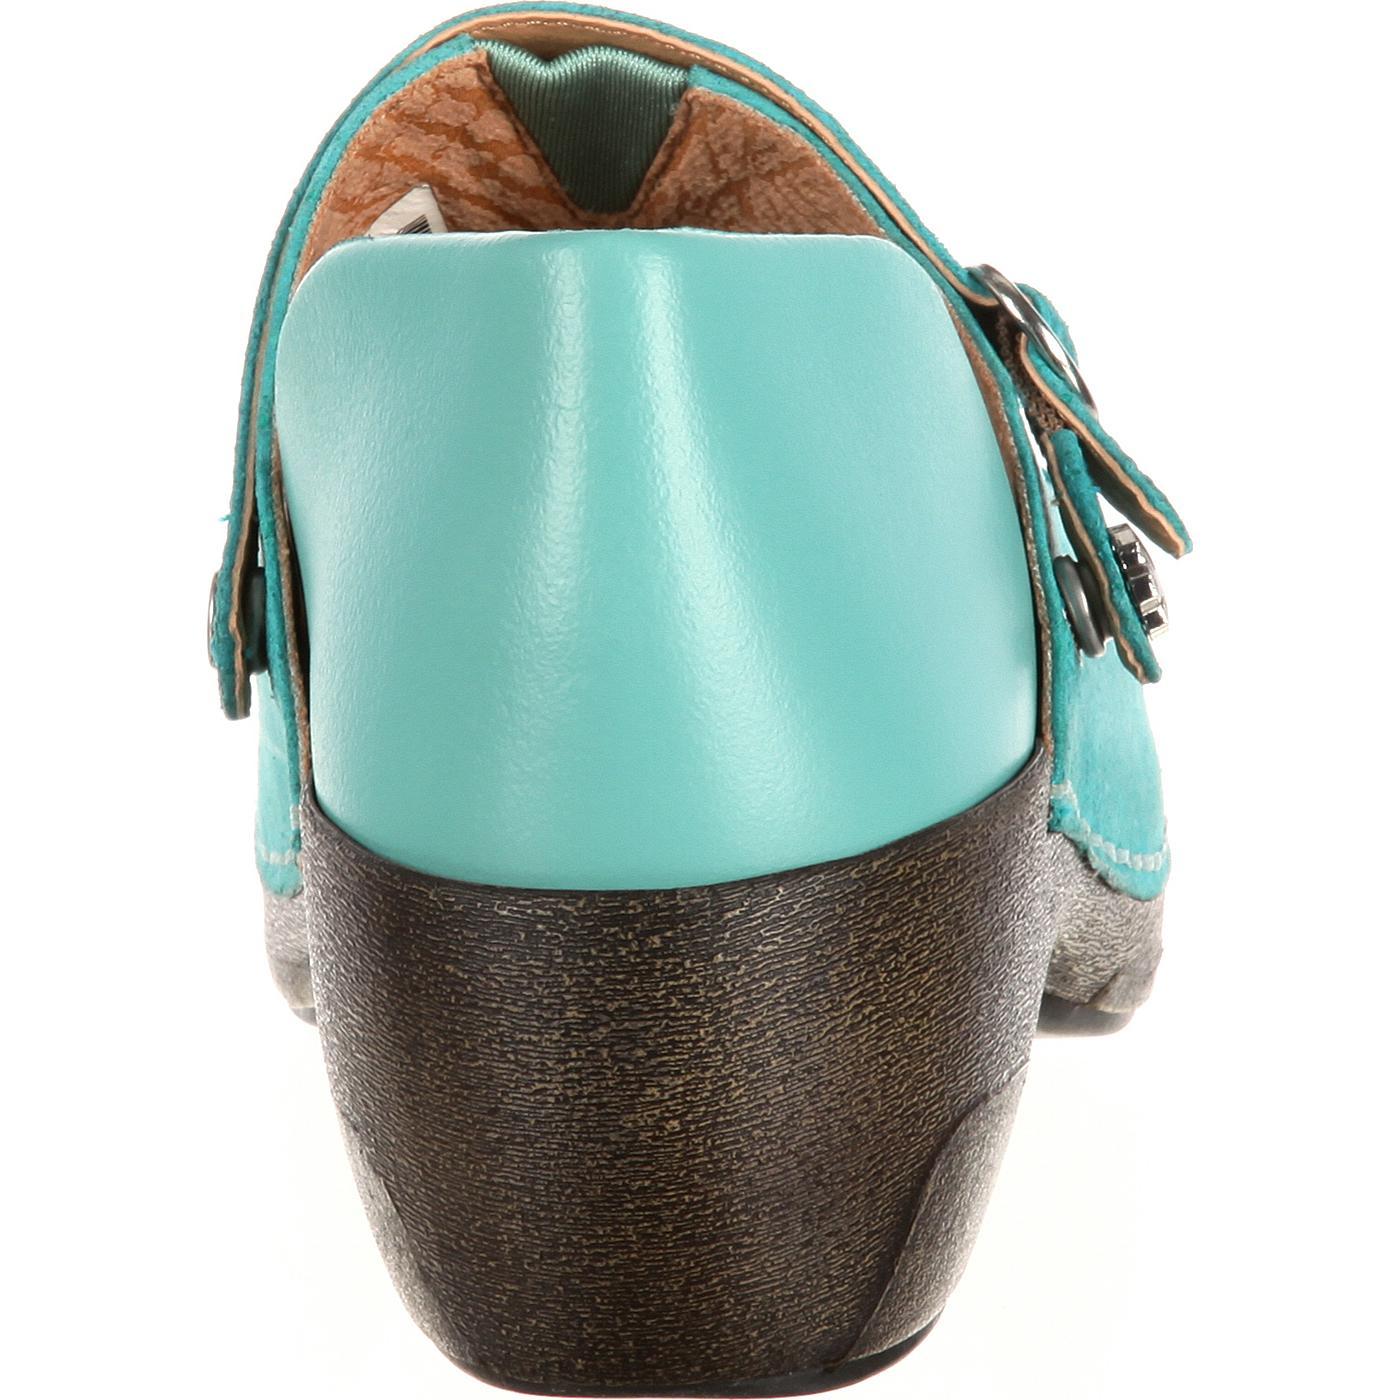 228dae6d141b9 4EurSole Inspire Me Women's Western Embellished Leather Clog